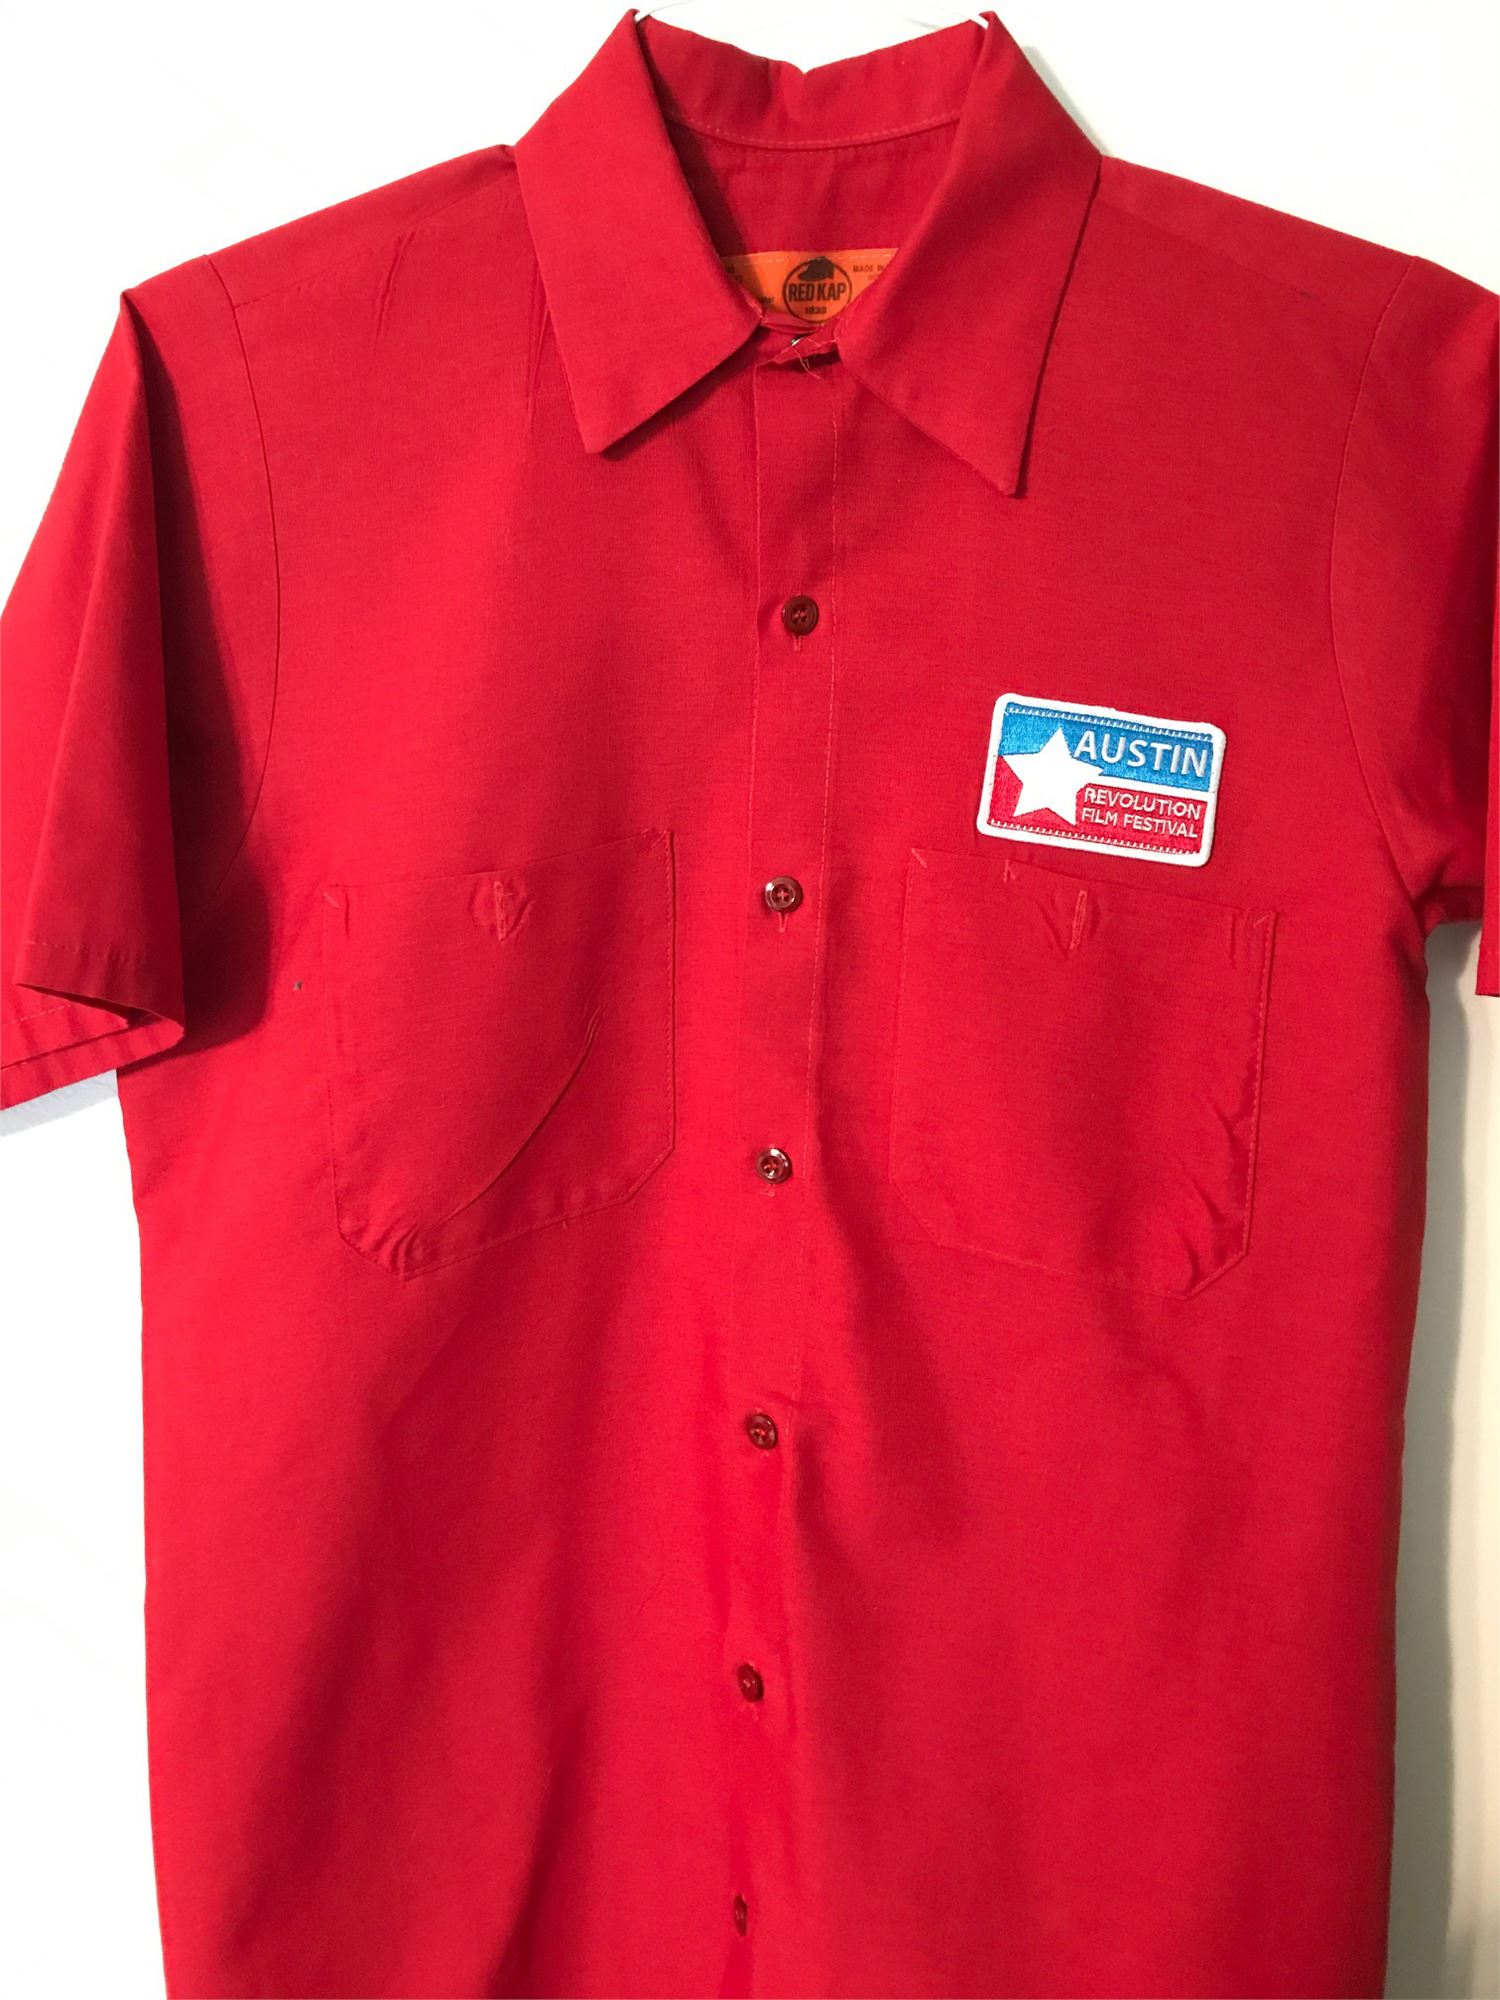 ARFF Work Shirt - Red